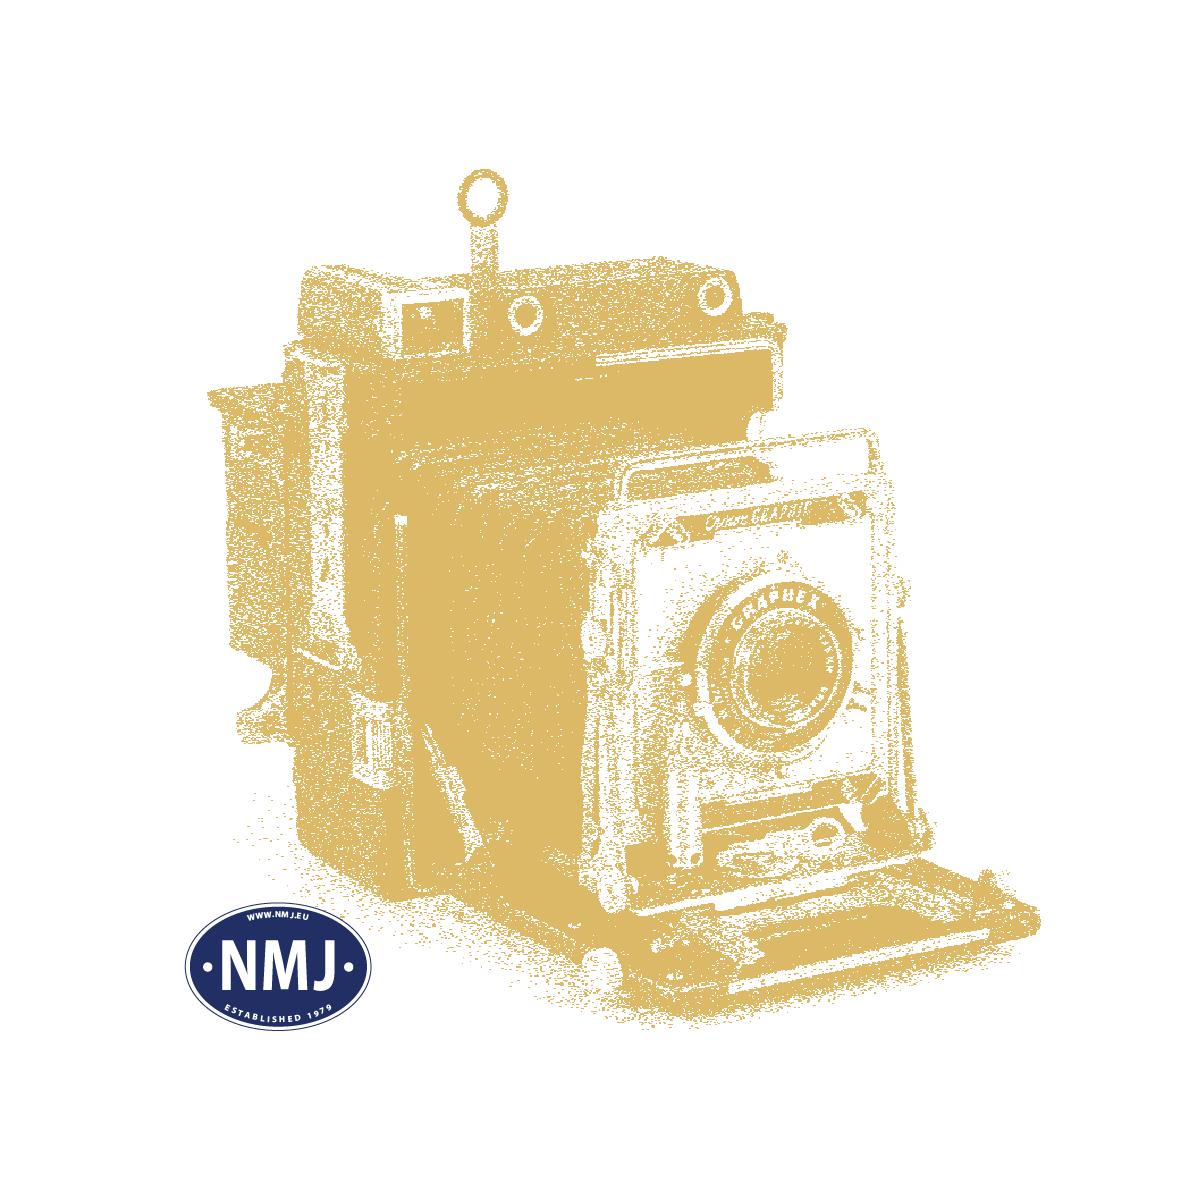 "NMJT90007 - NMJ Topline NSB Di3a.609 ""Nohab"", DCC m/ Sound"